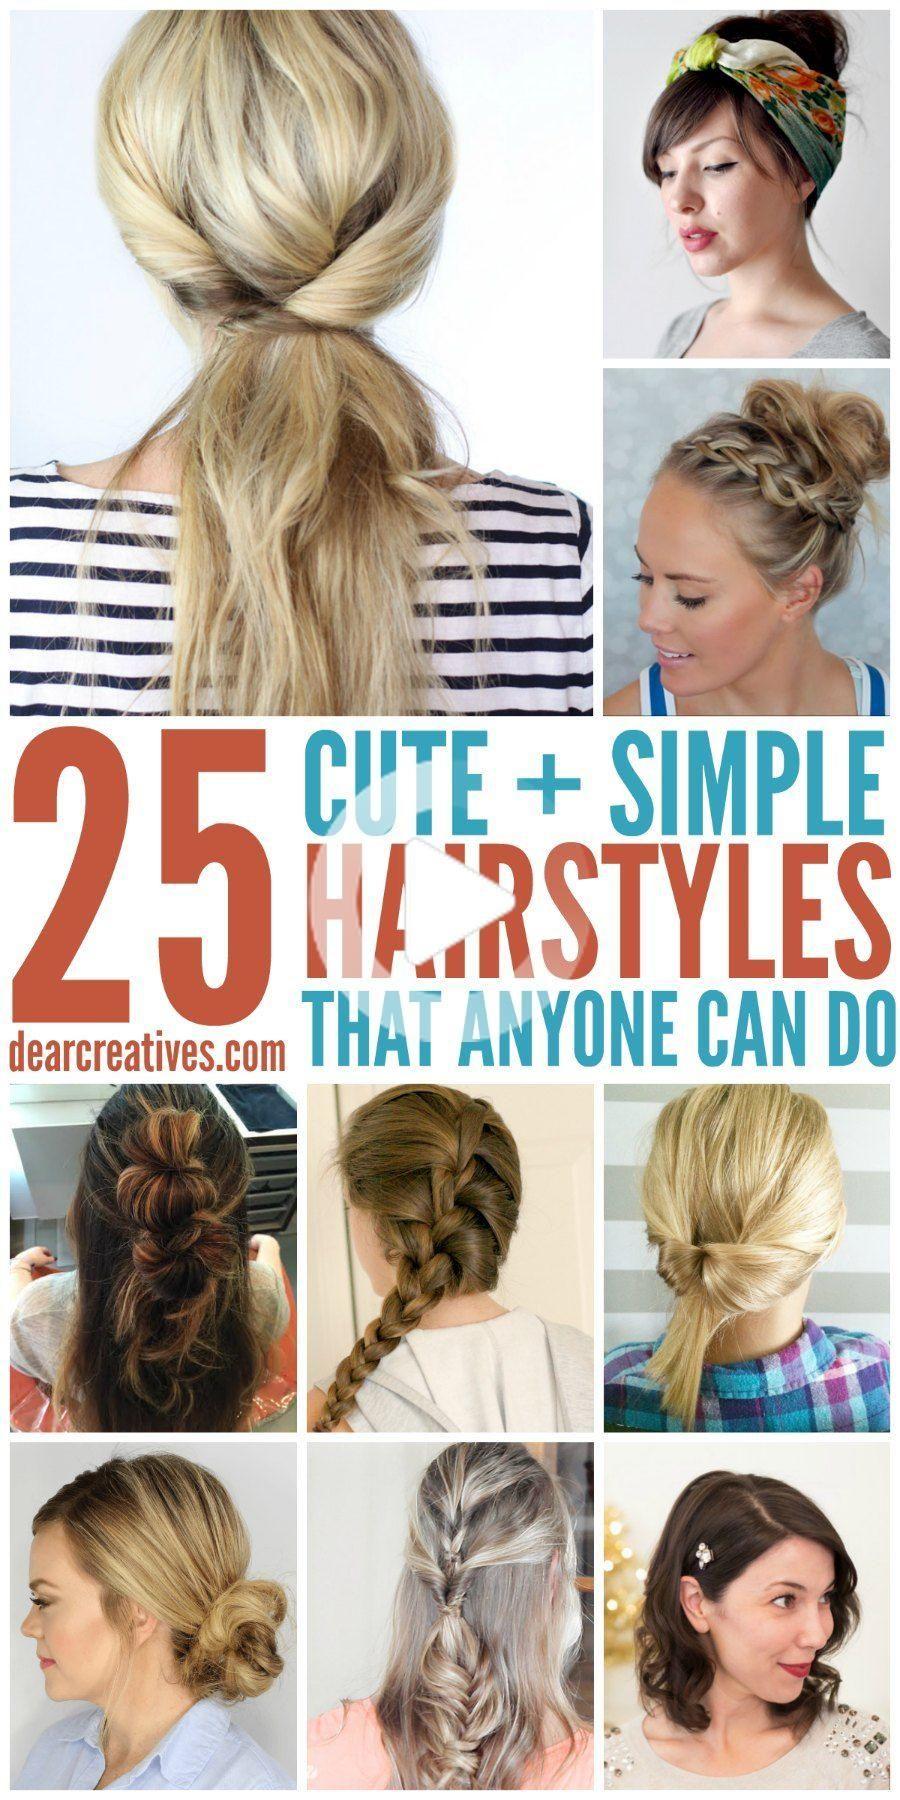 How To Do Easy Hairstyles In 2020 Easy Hairstyles Cute Simple Hairstyles Medium Hair Styles